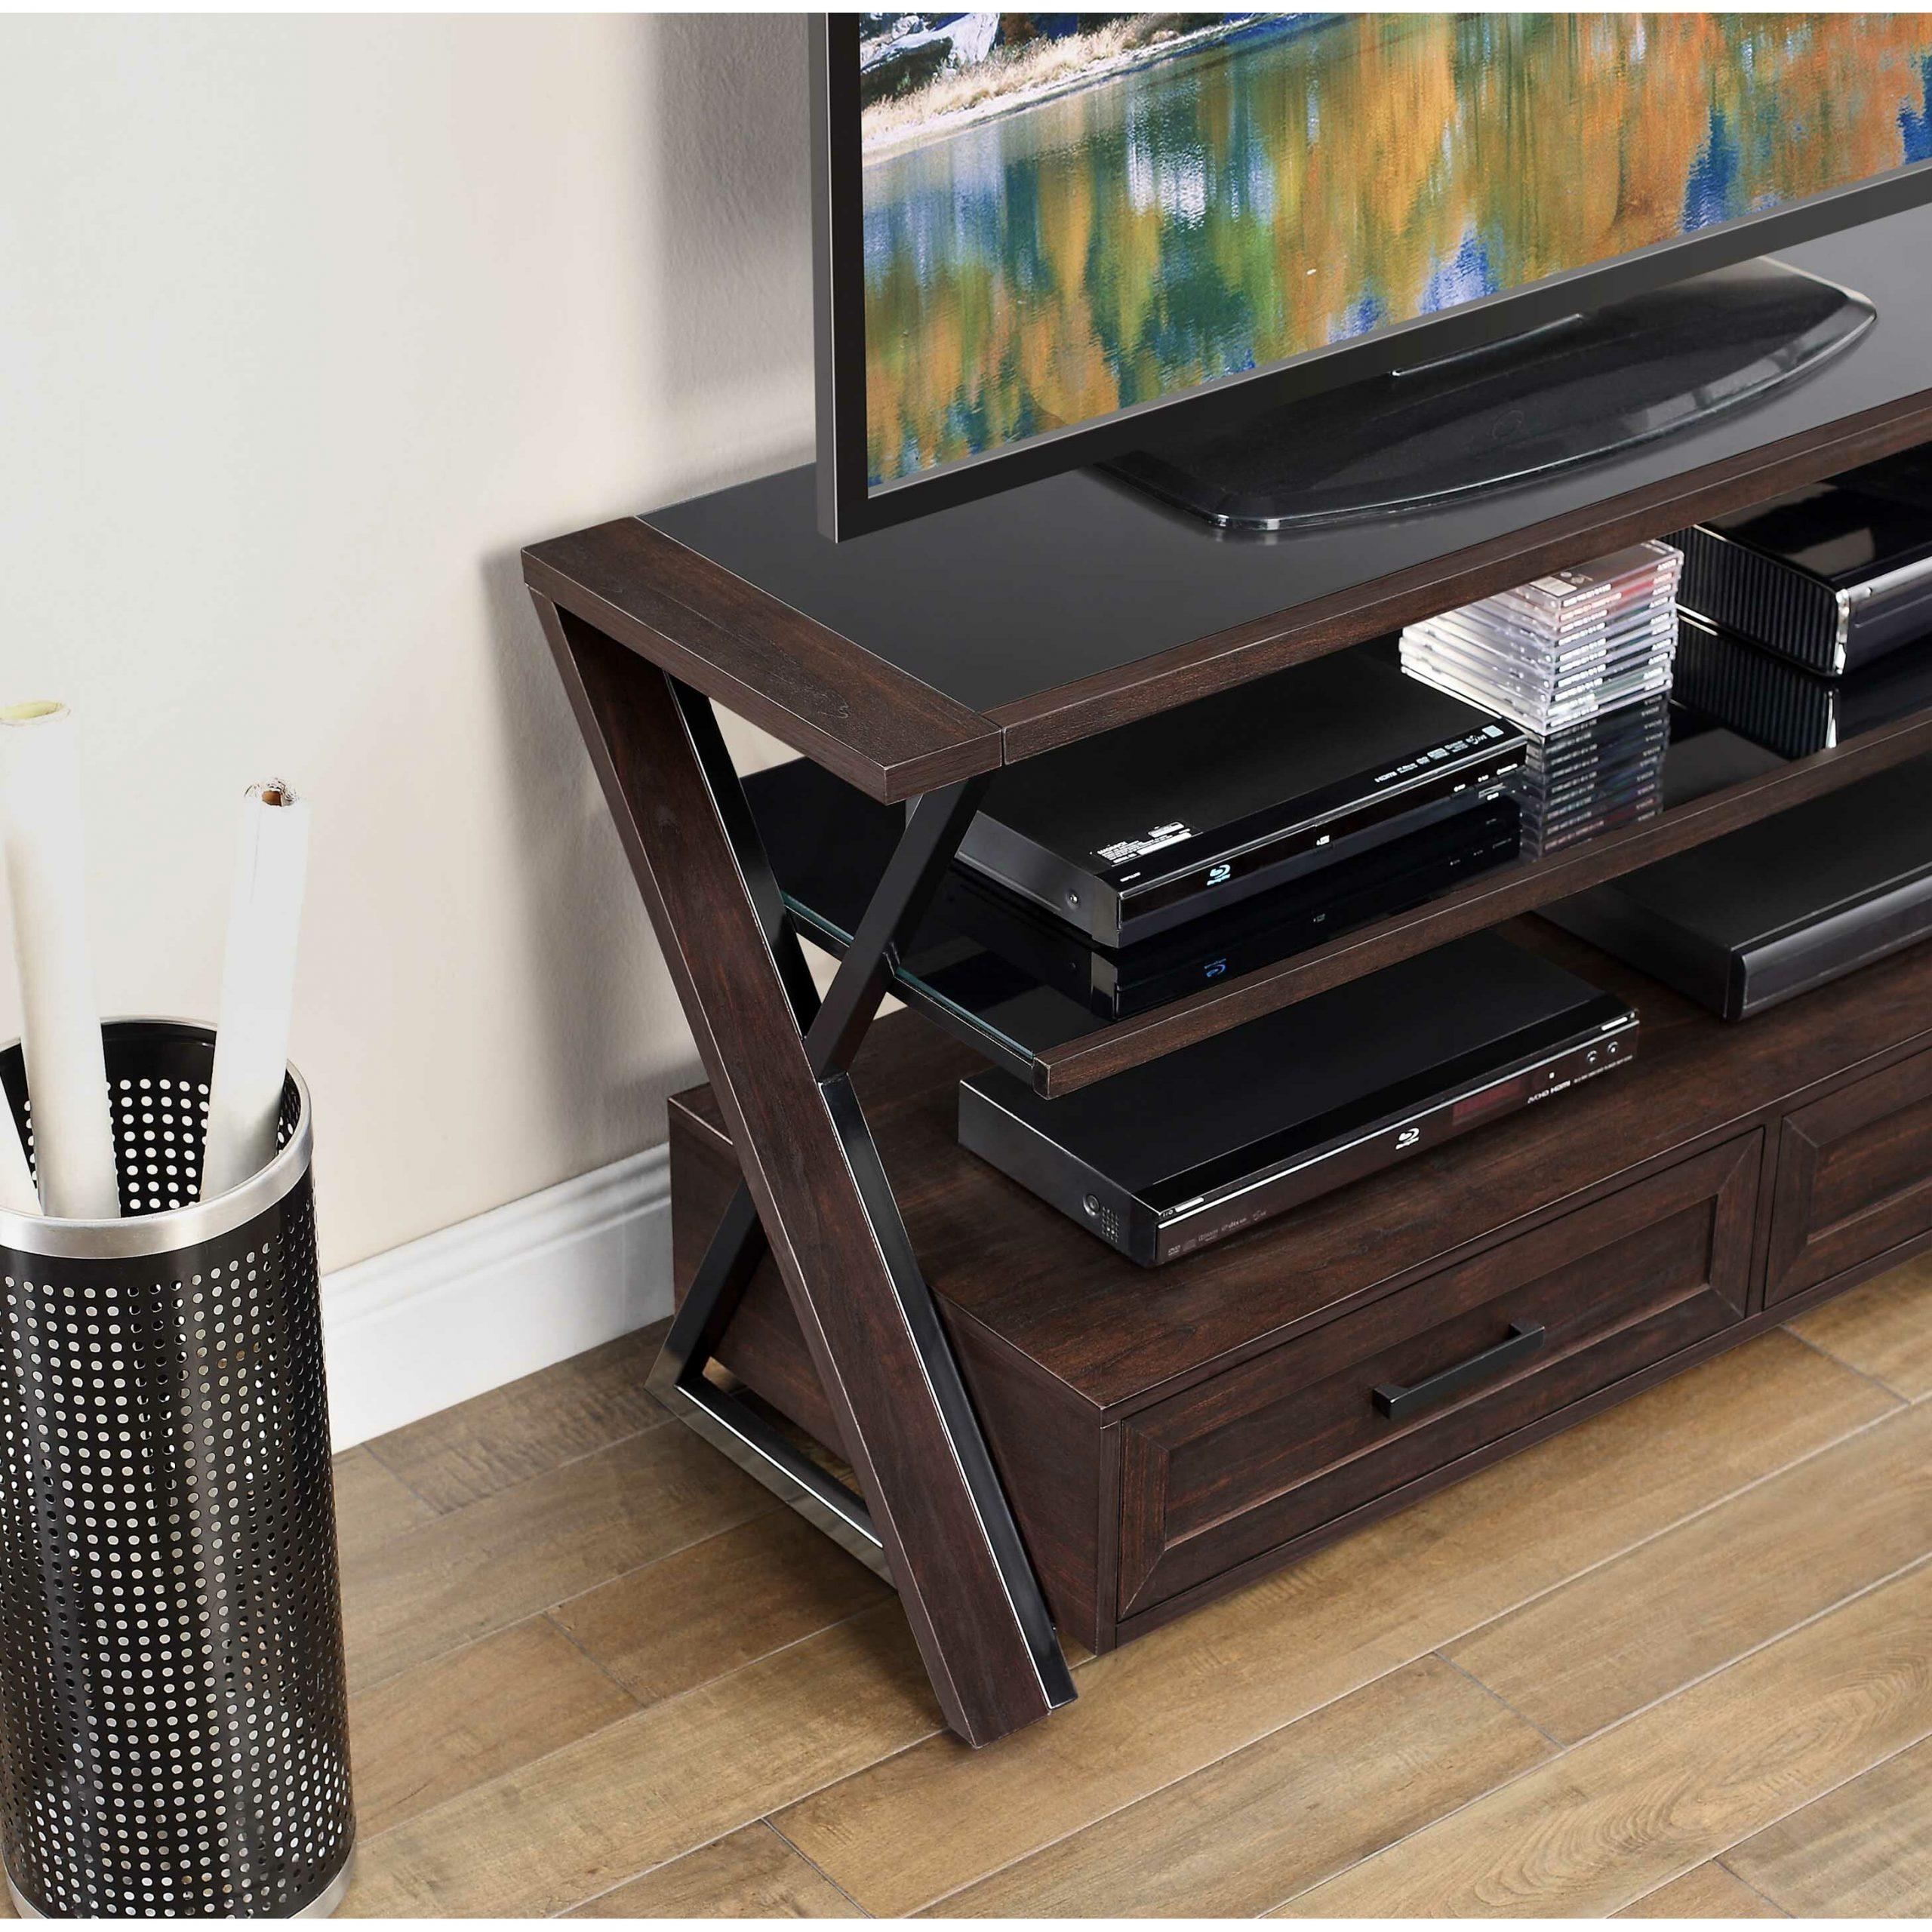 Whalen Furniture Stinson Tv Stand & Reviews | Wayfair Inside Priya Tv Stands (View 5 of 17)